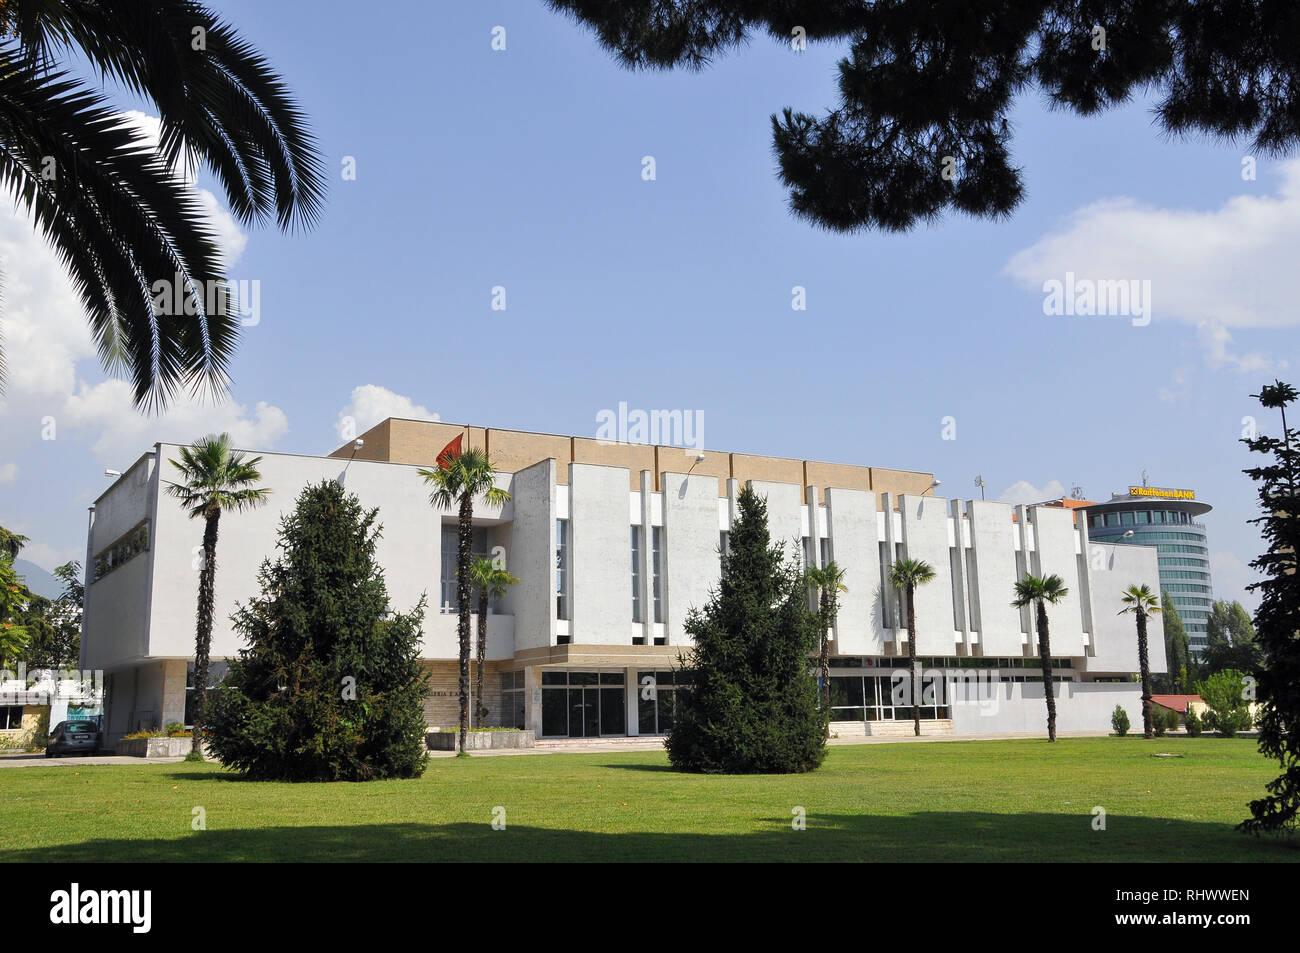 Tirana, Albania, Europe. - Stock Image